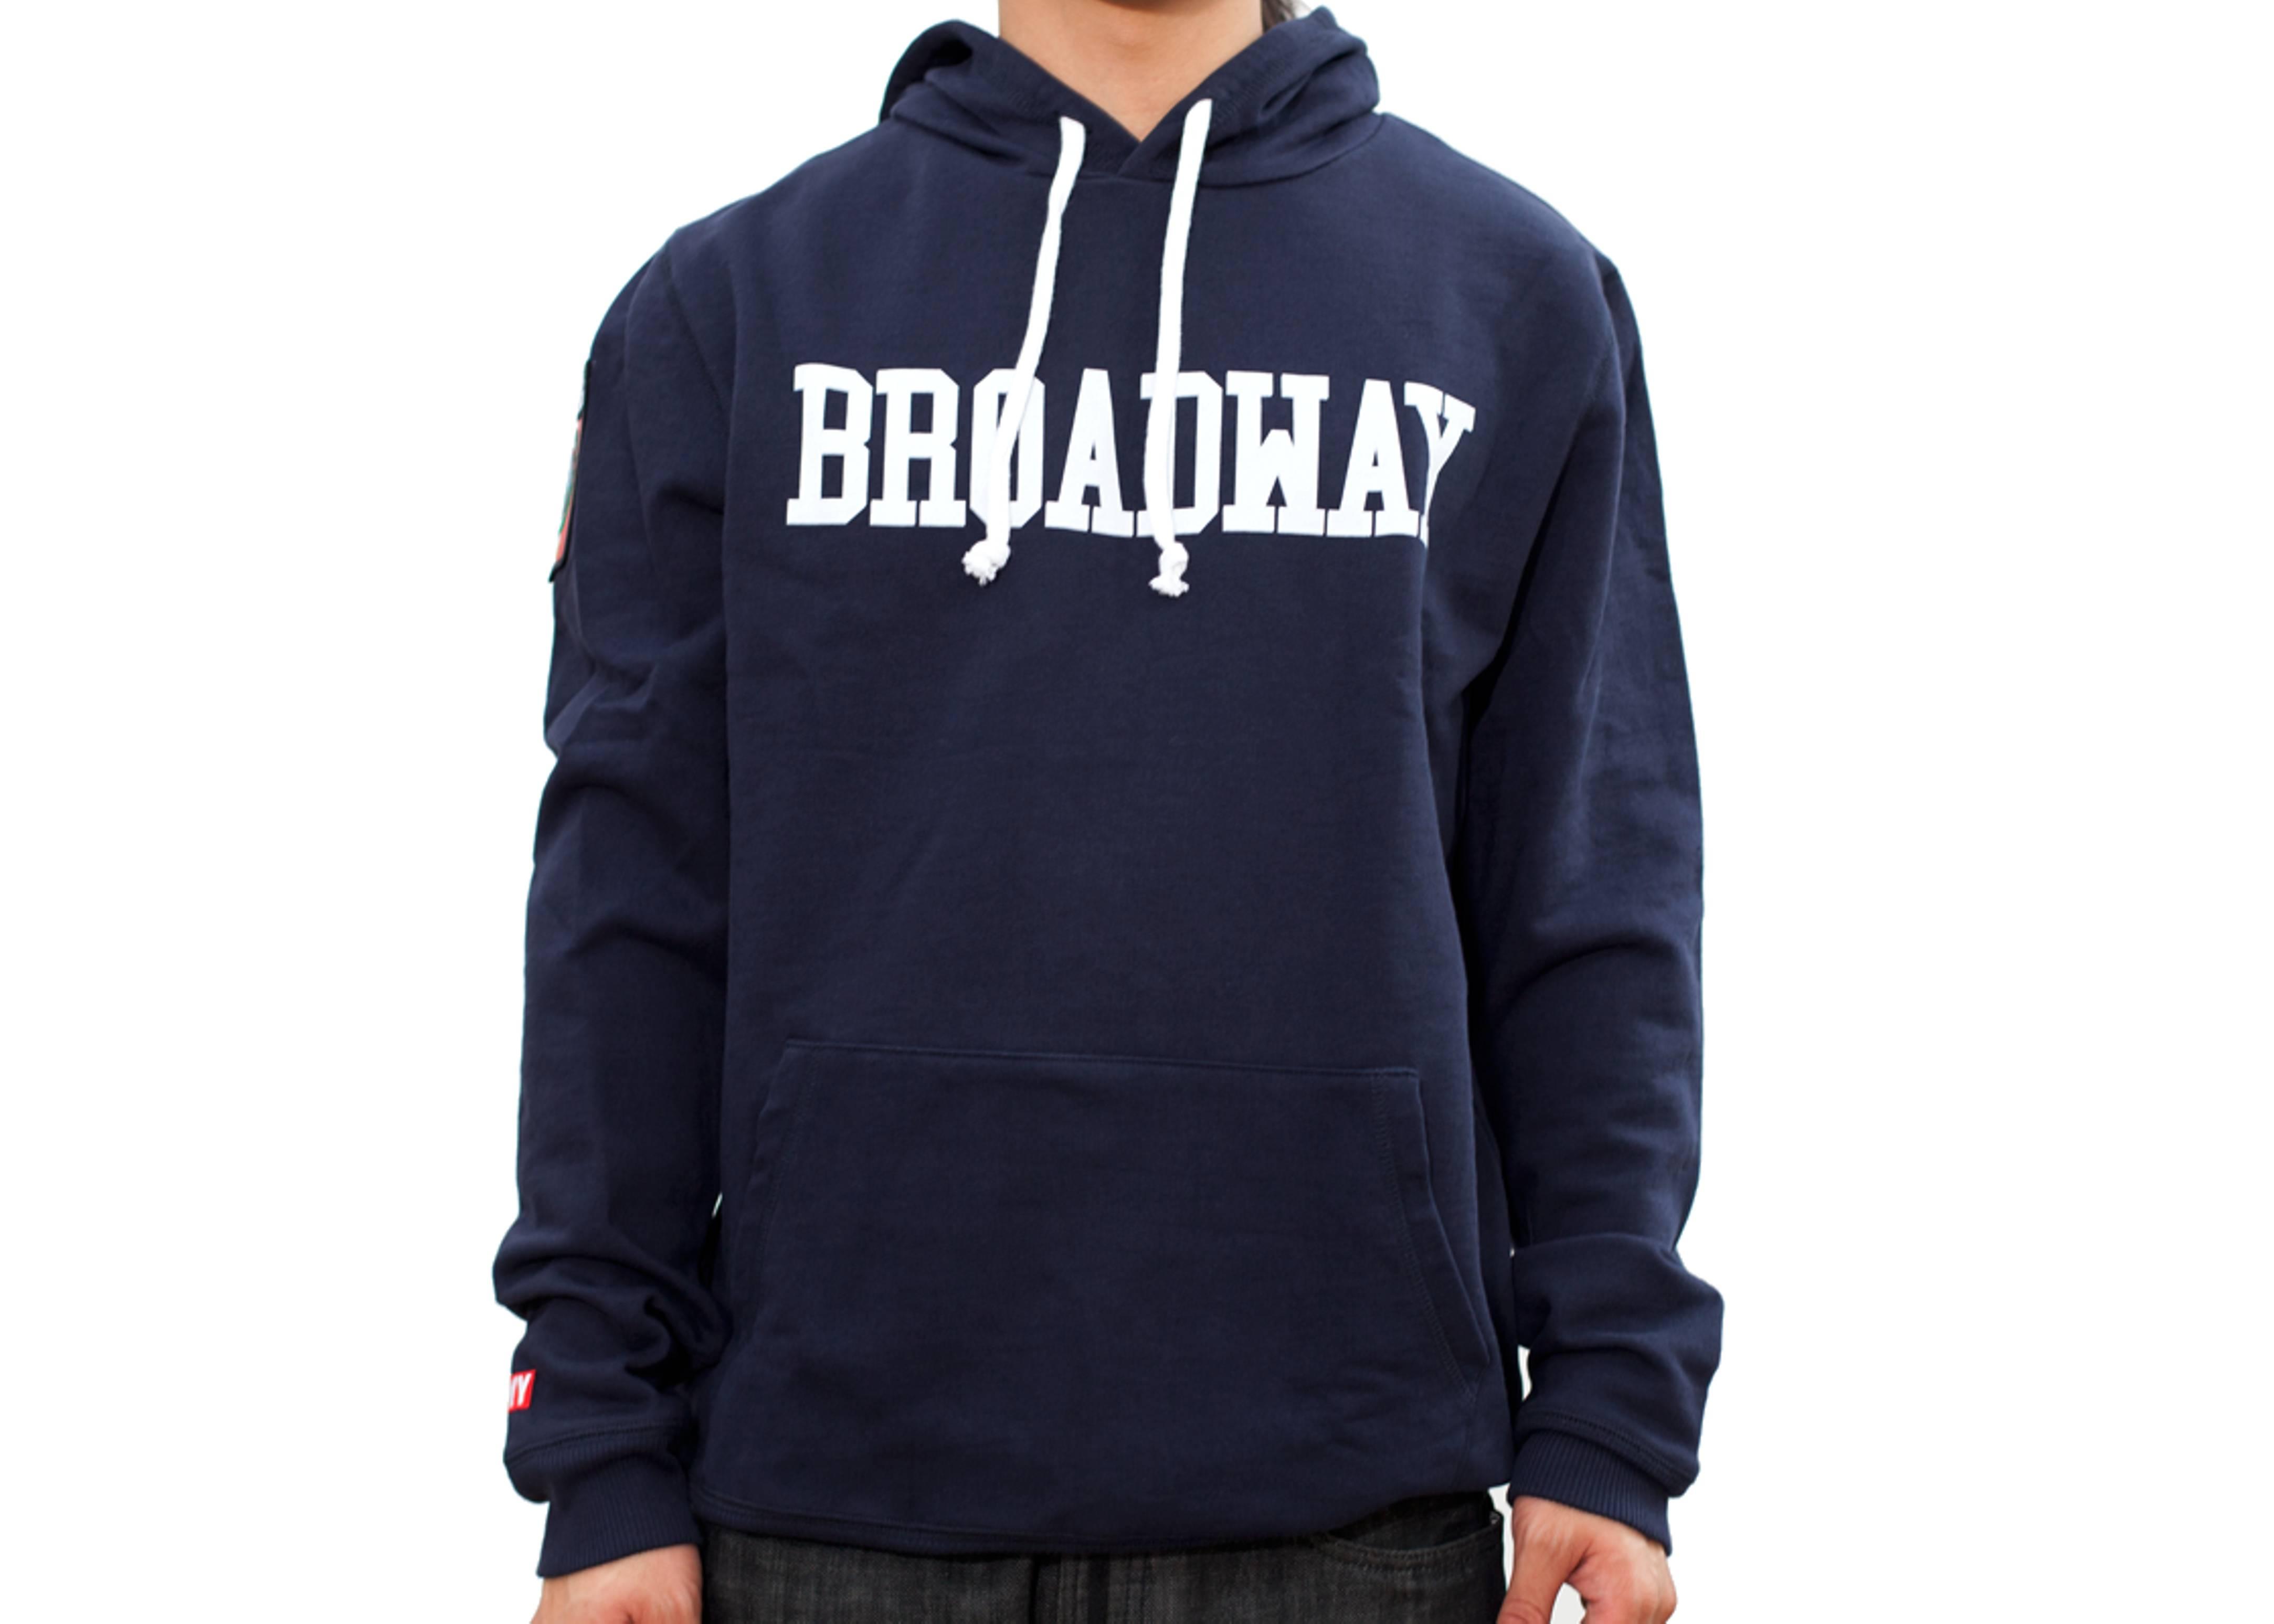 fcny broadway hoody